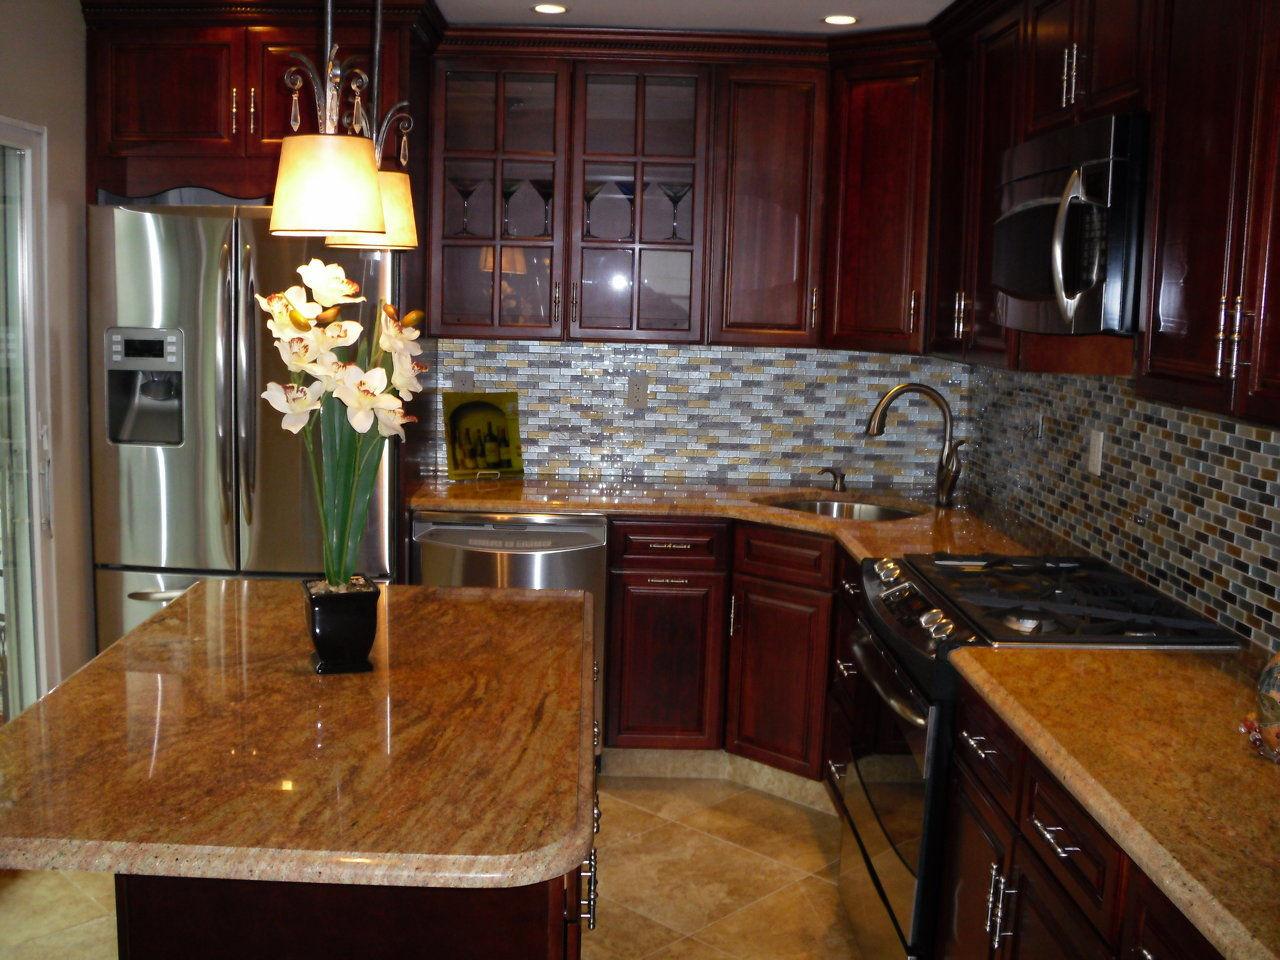 monumetal kitchen cabinets staten island new york granite countertops staten island. Black Bedroom Furniture Sets. Home Design Ideas